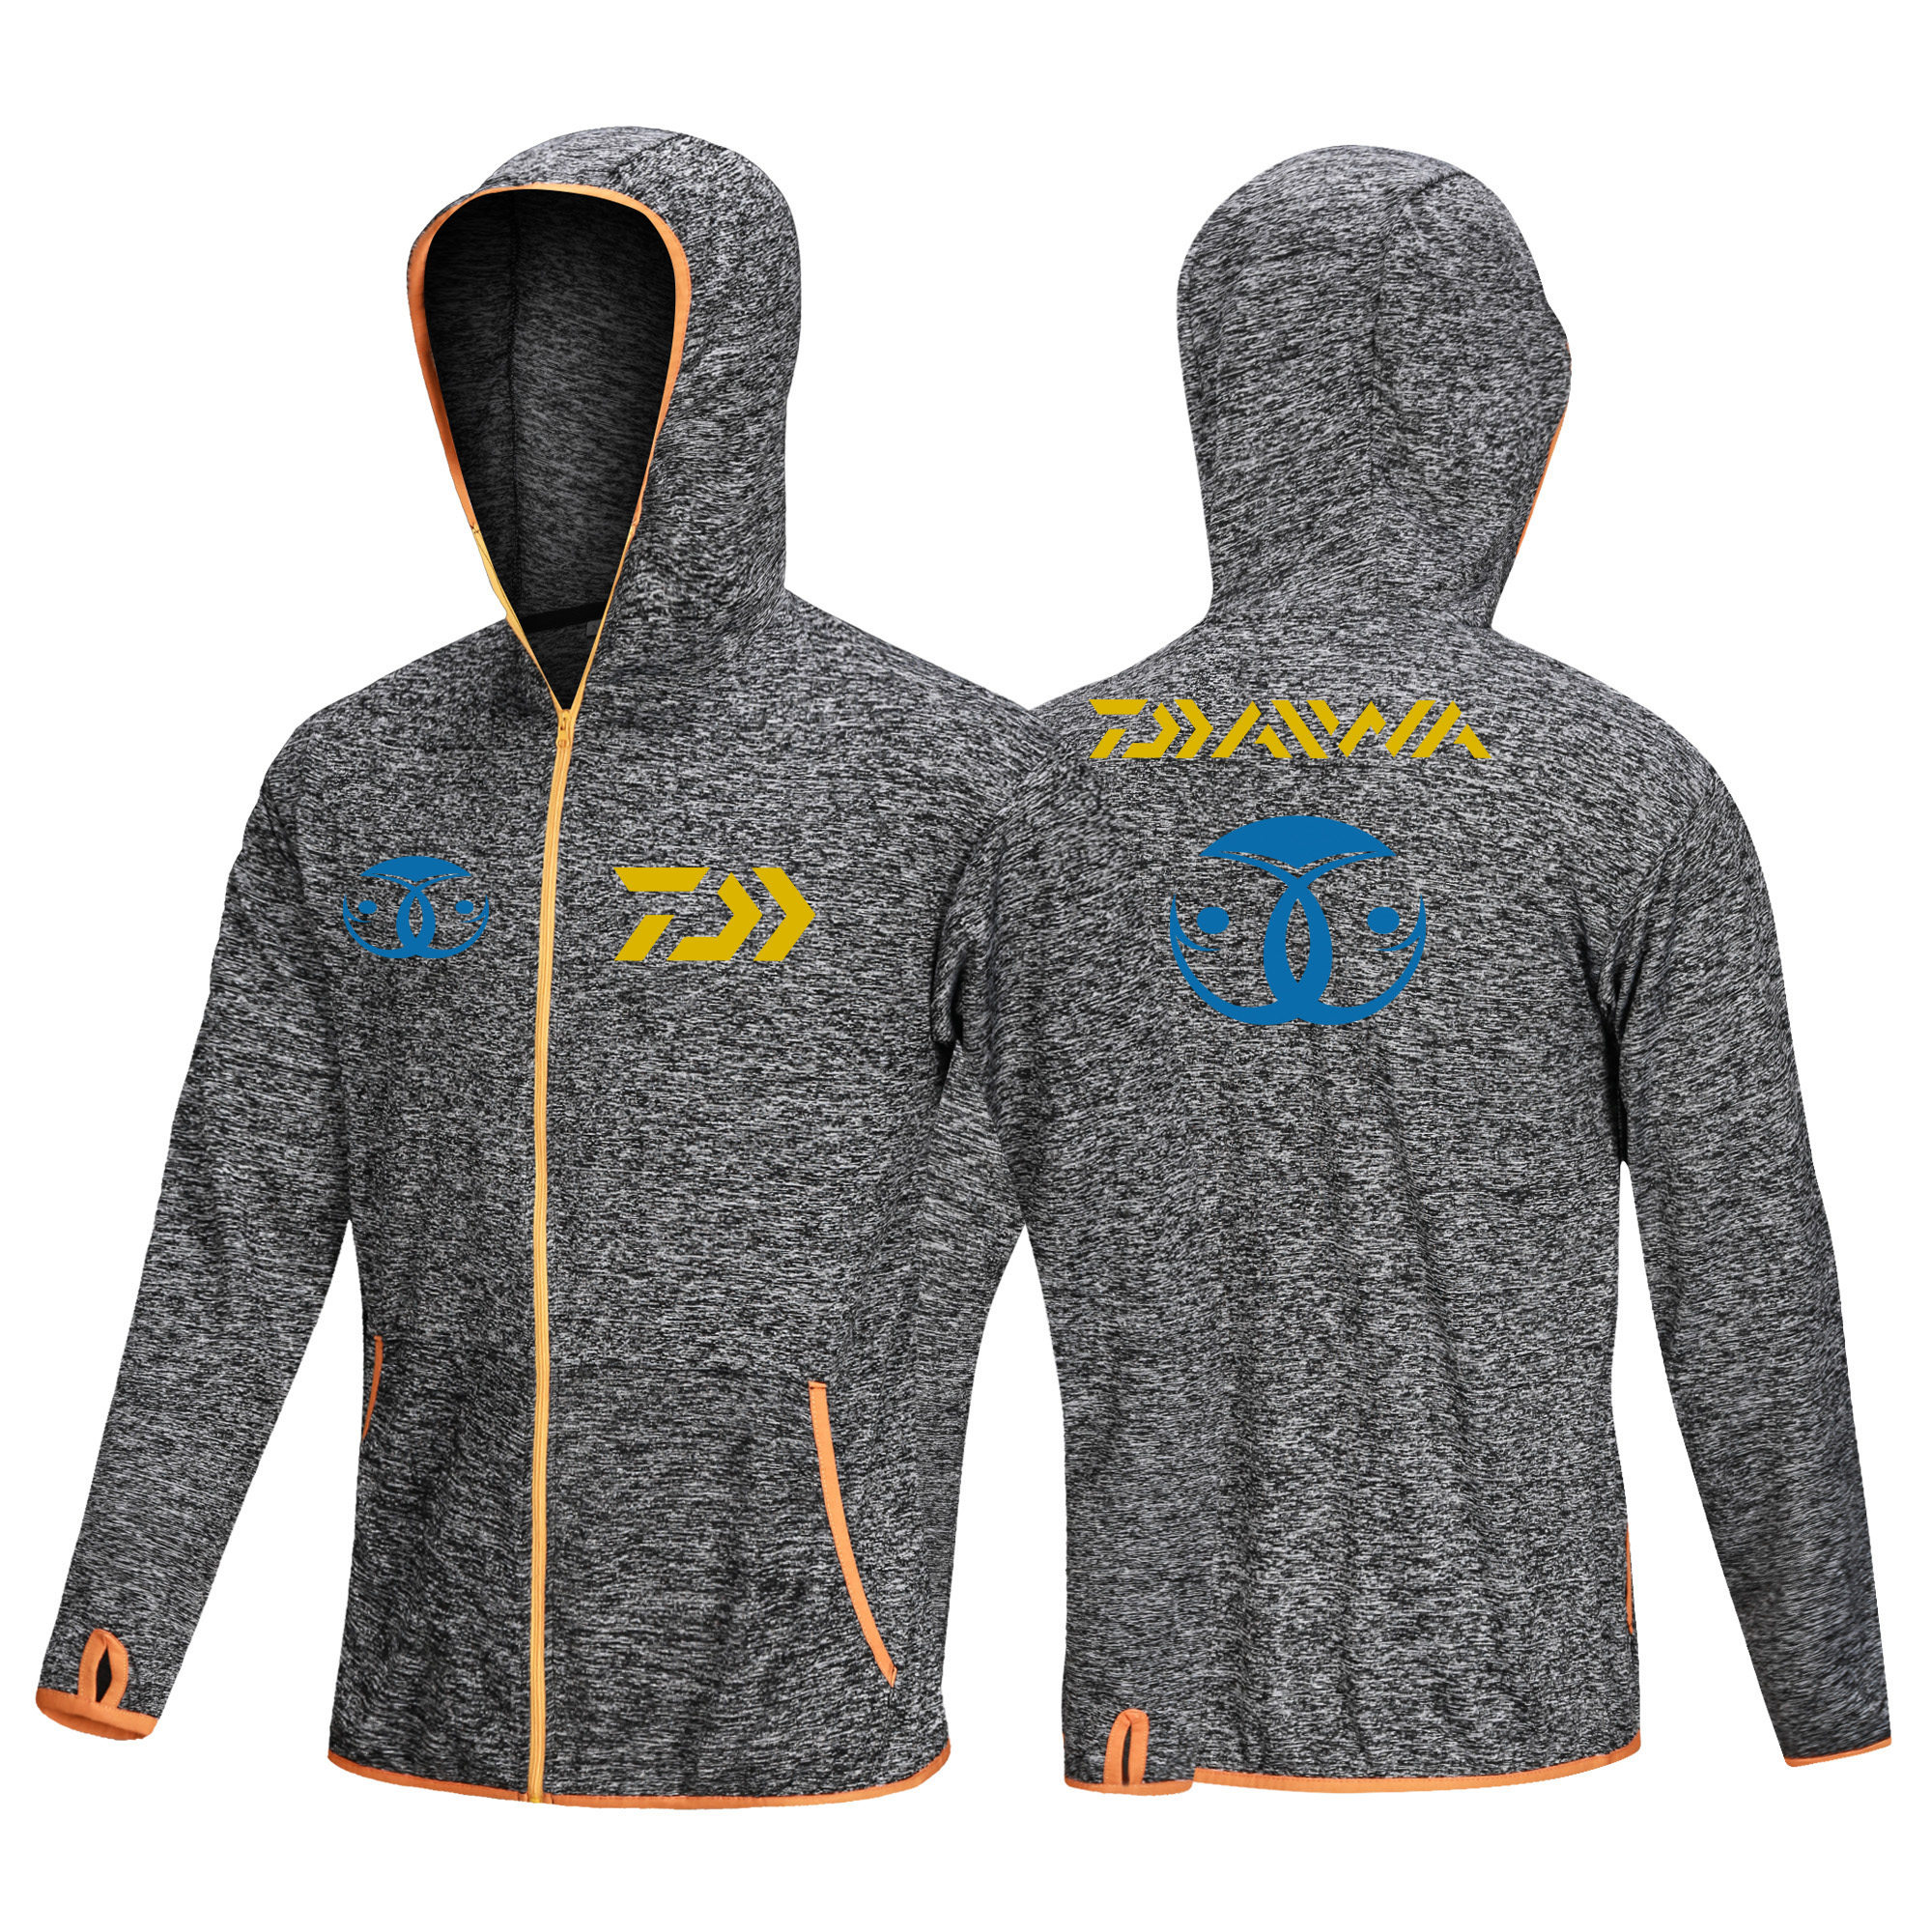 2020 Sport Fishing Shirt Long Sleeve Quick-drying Breathable Professional Hiking shirt Fishing Clothes Sport Fishing Clothes